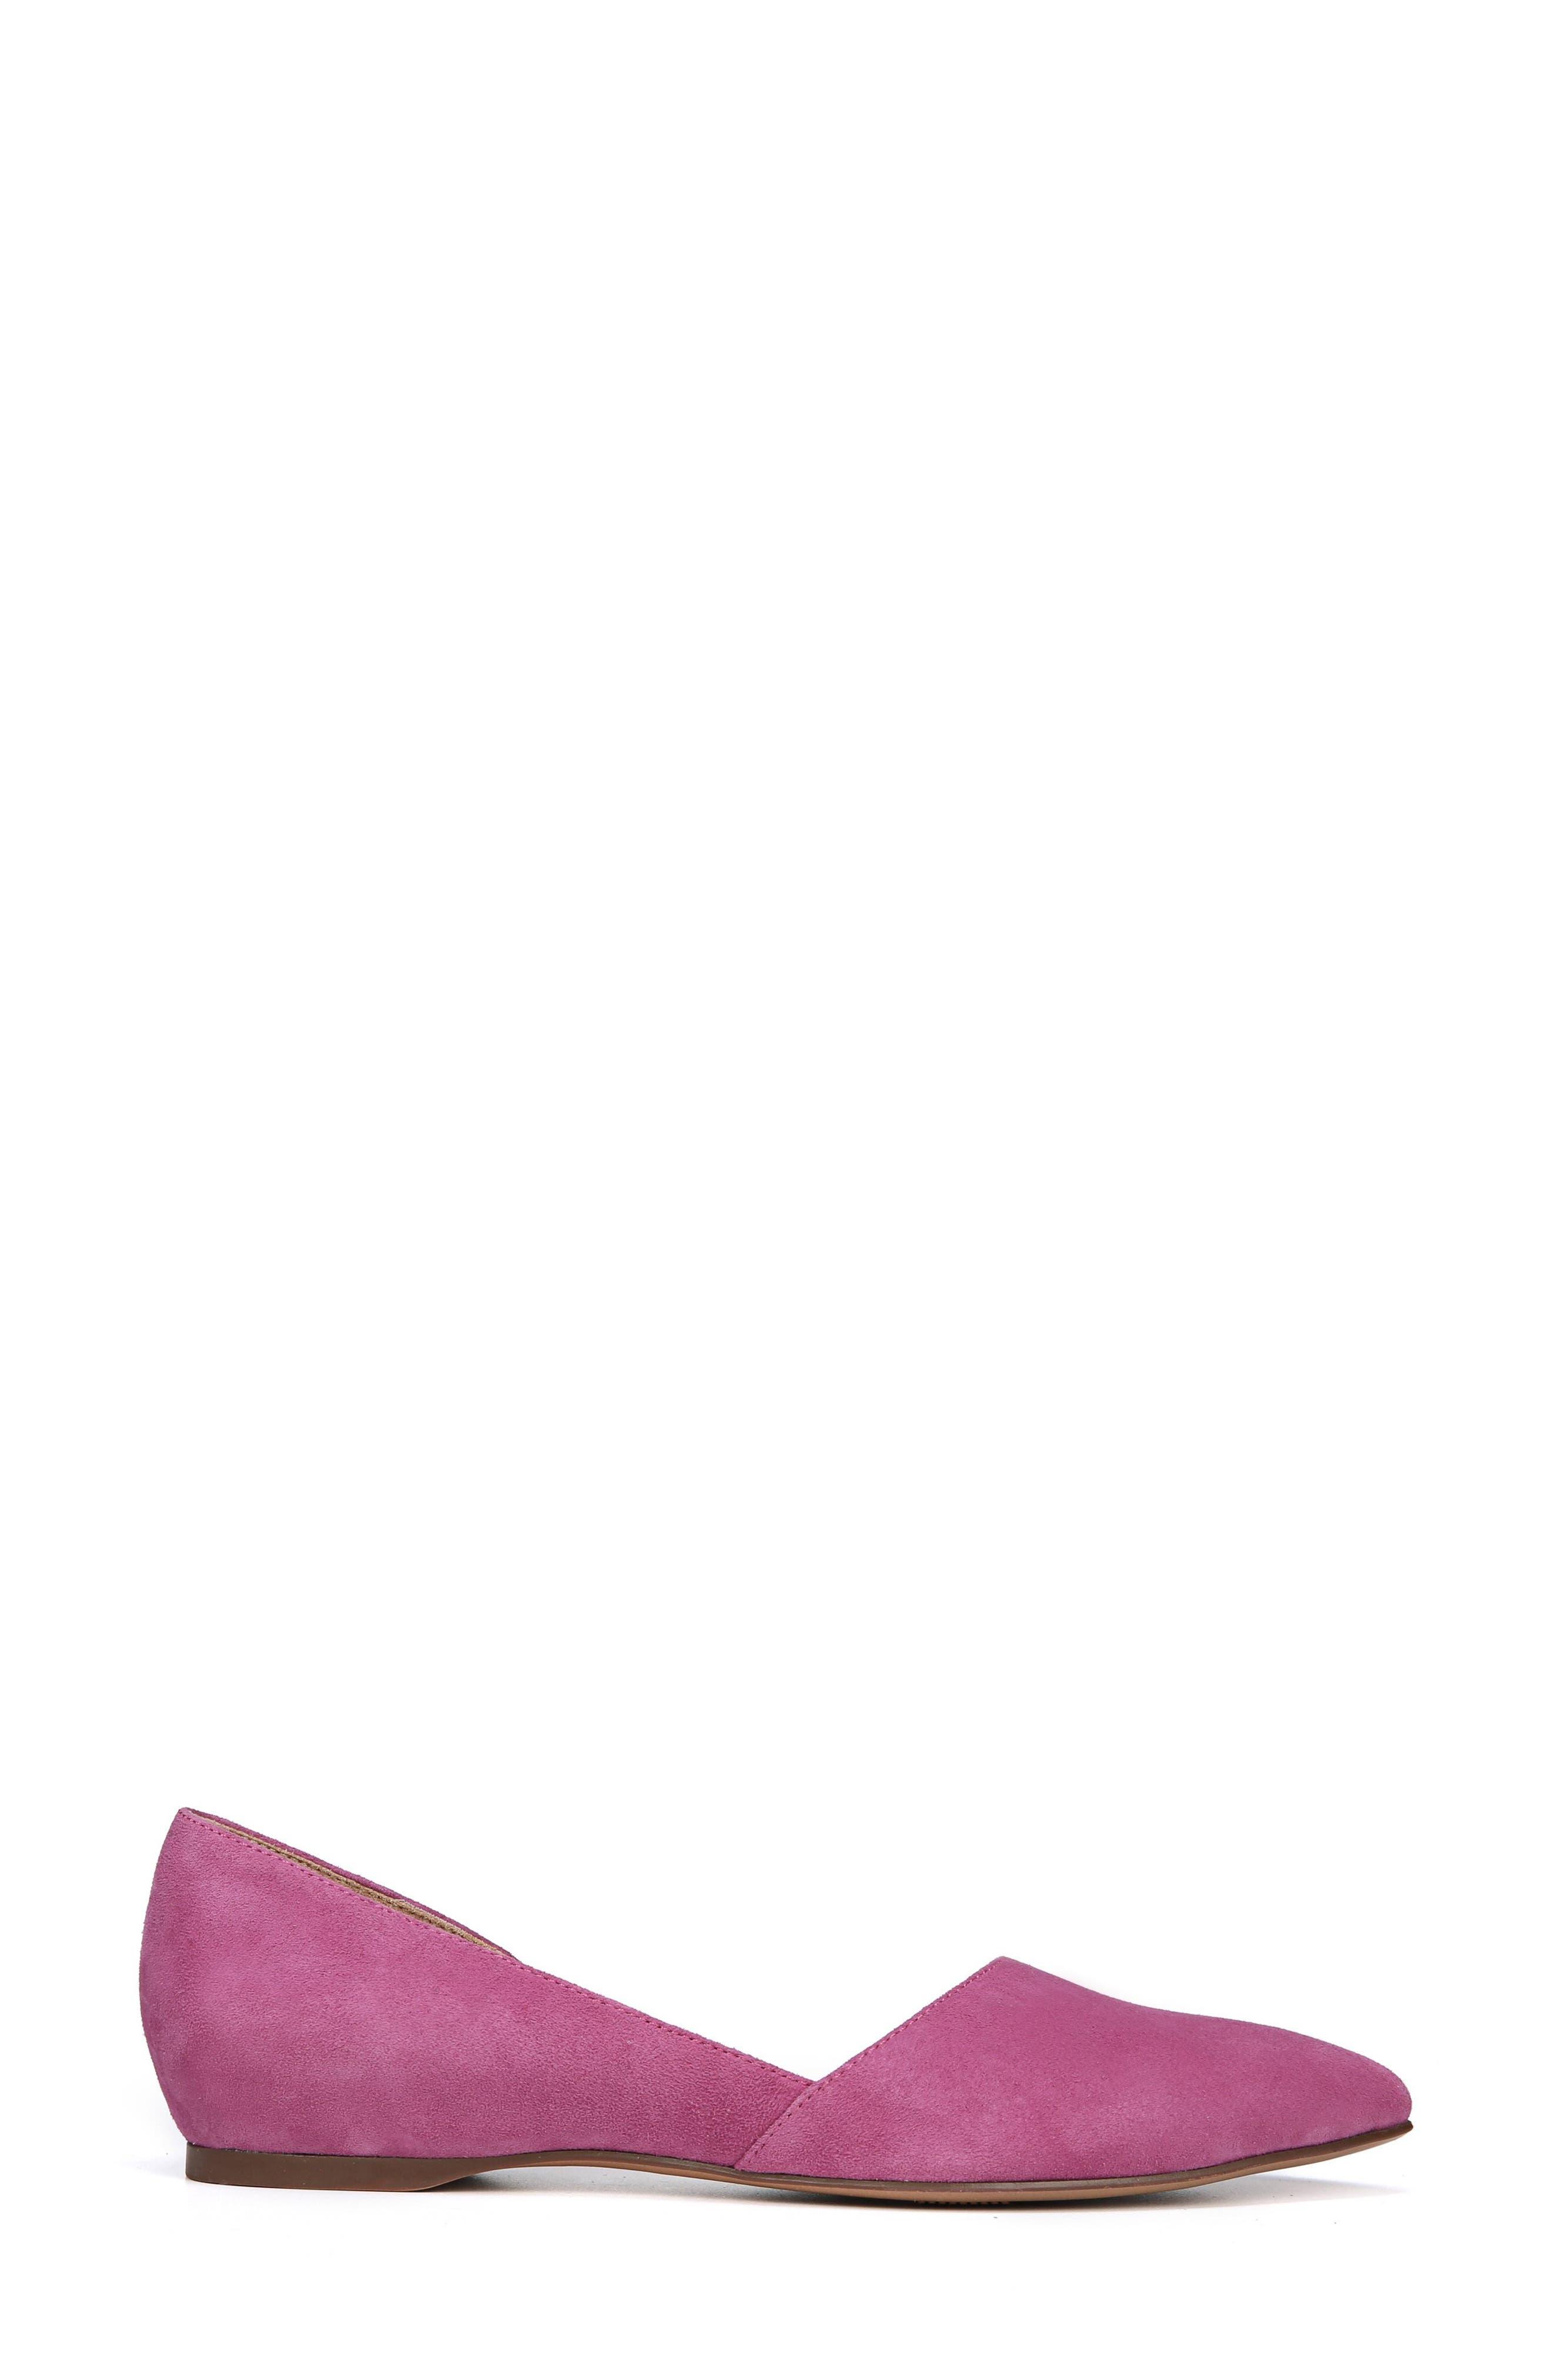 NATURALIZER, Samantha Half d'Orsay Flat, Alternate thumbnail 3, color, RADIANT ORCHID SUEDE